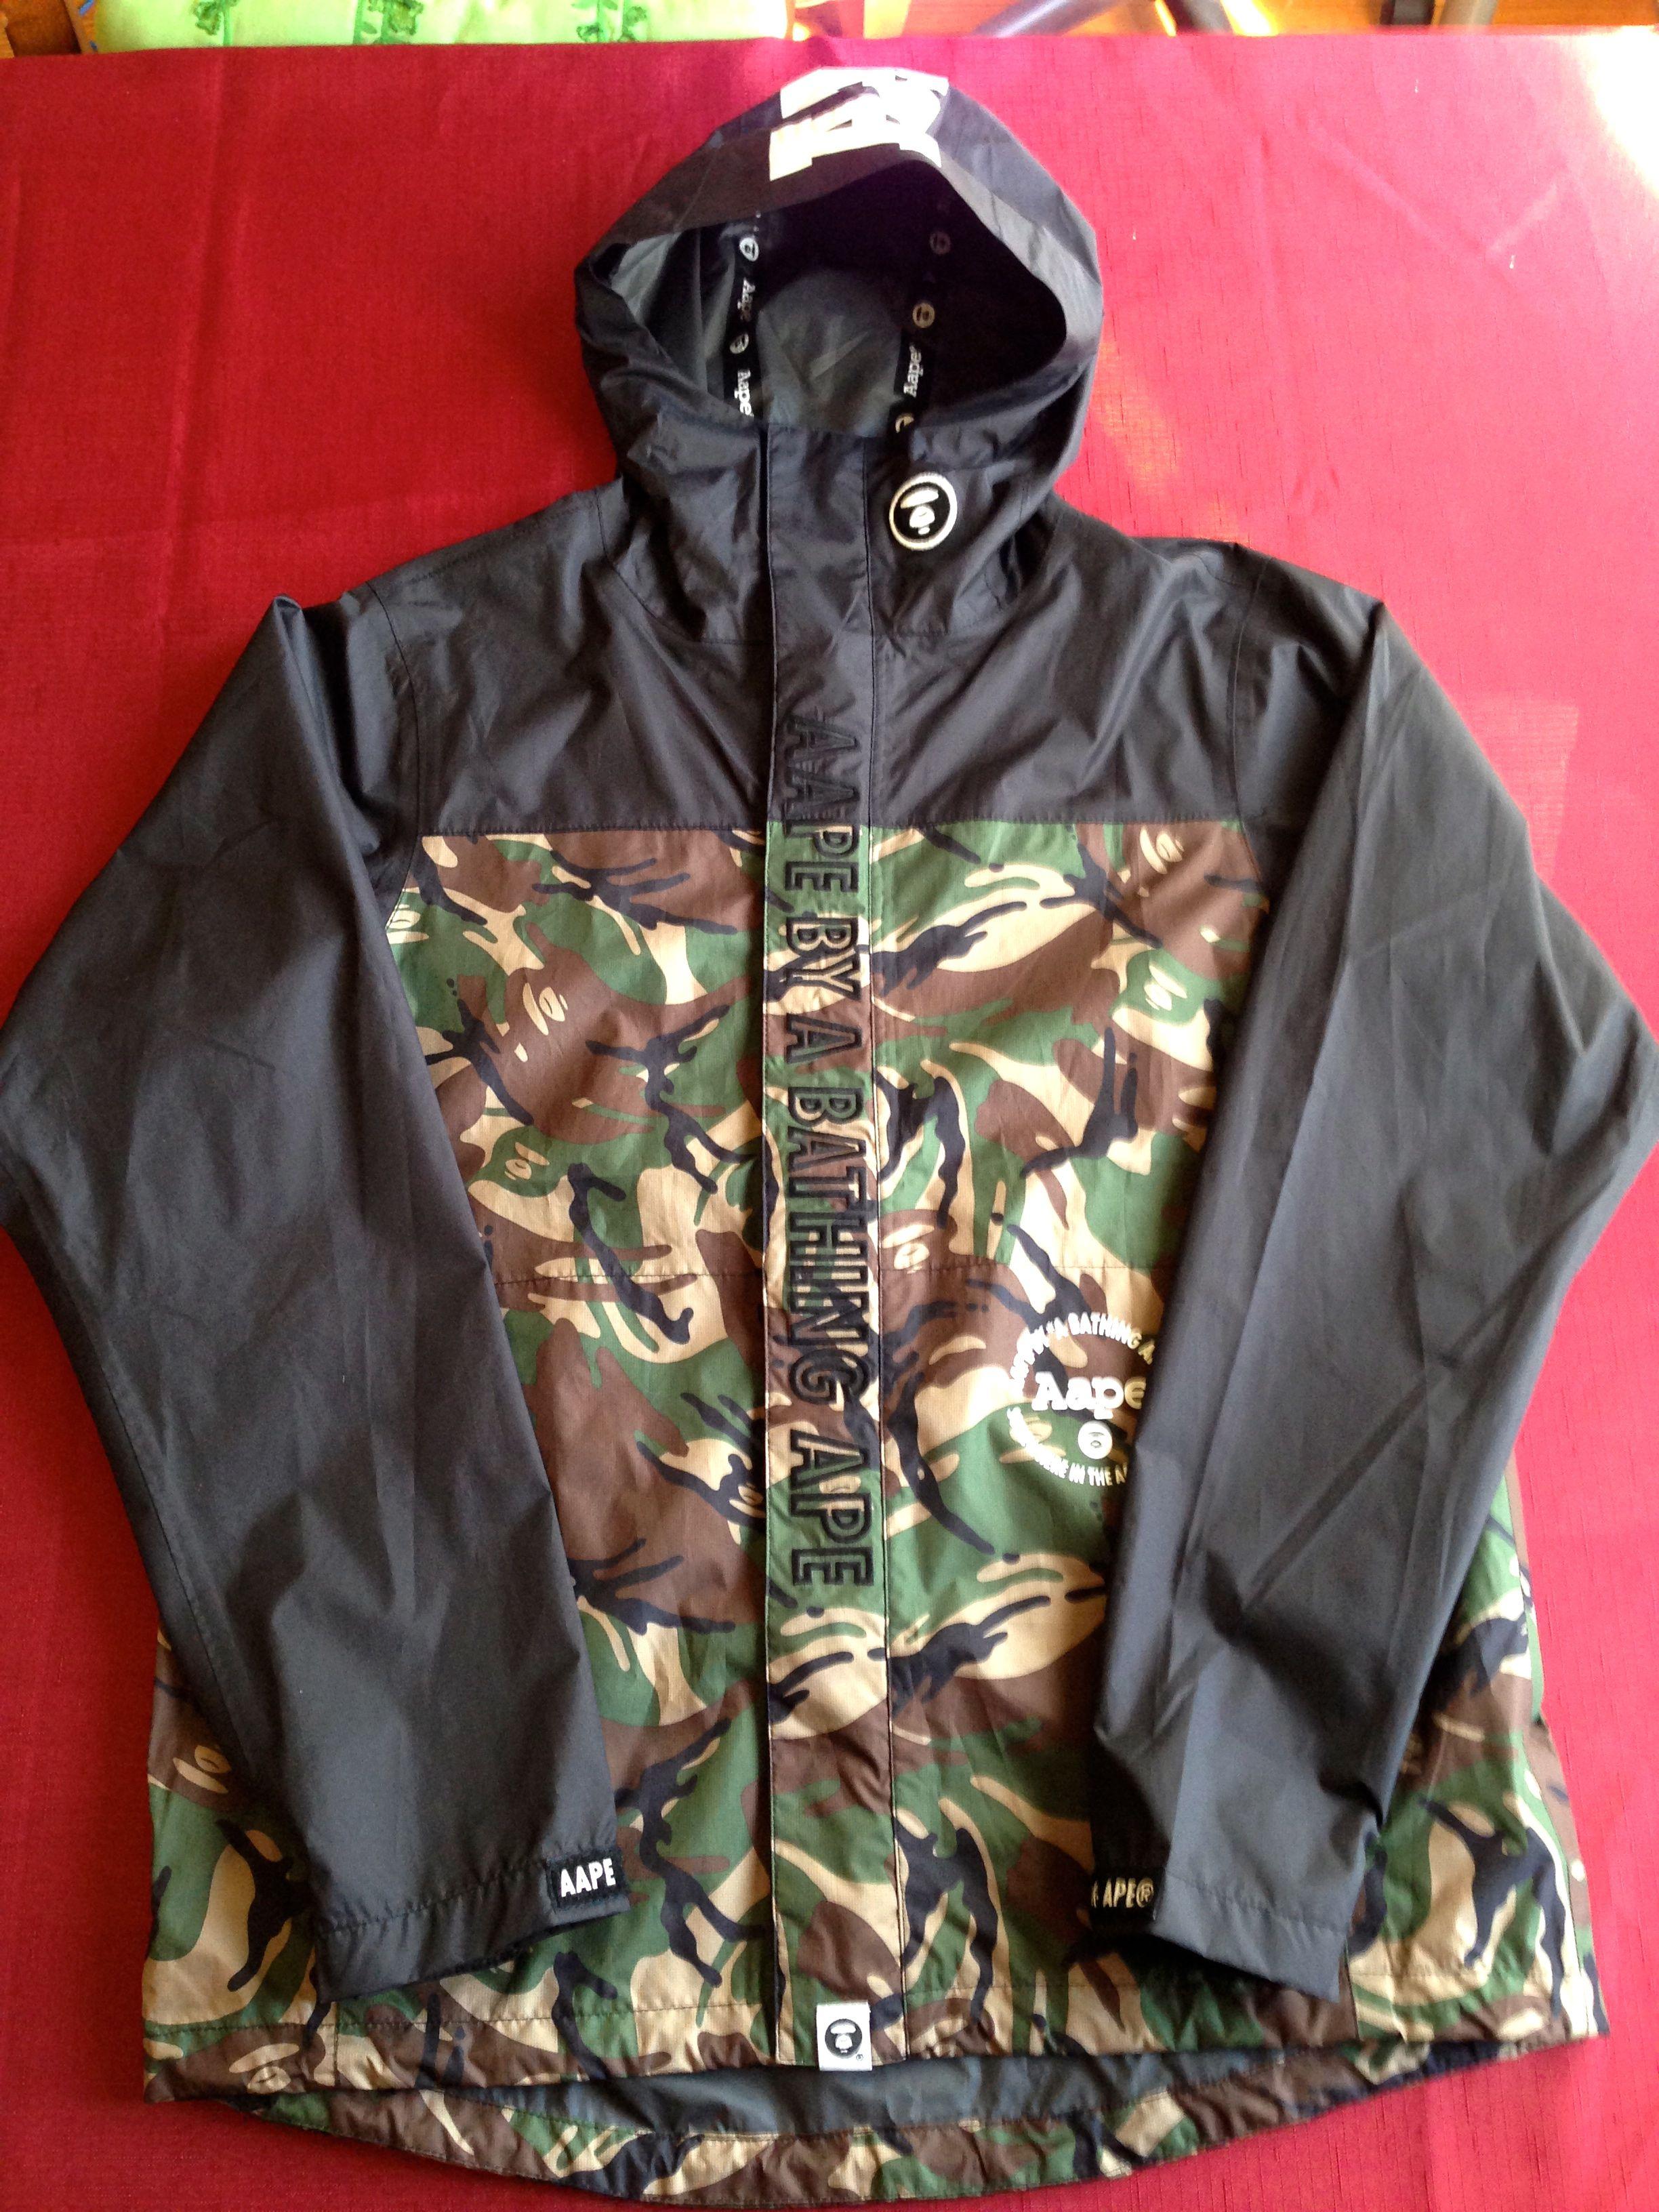 706da56cba09 Bape. AAPE By A Bathing Ape Hooded Zip Up Jacket Windbreaker Black Green  Camo BAPE